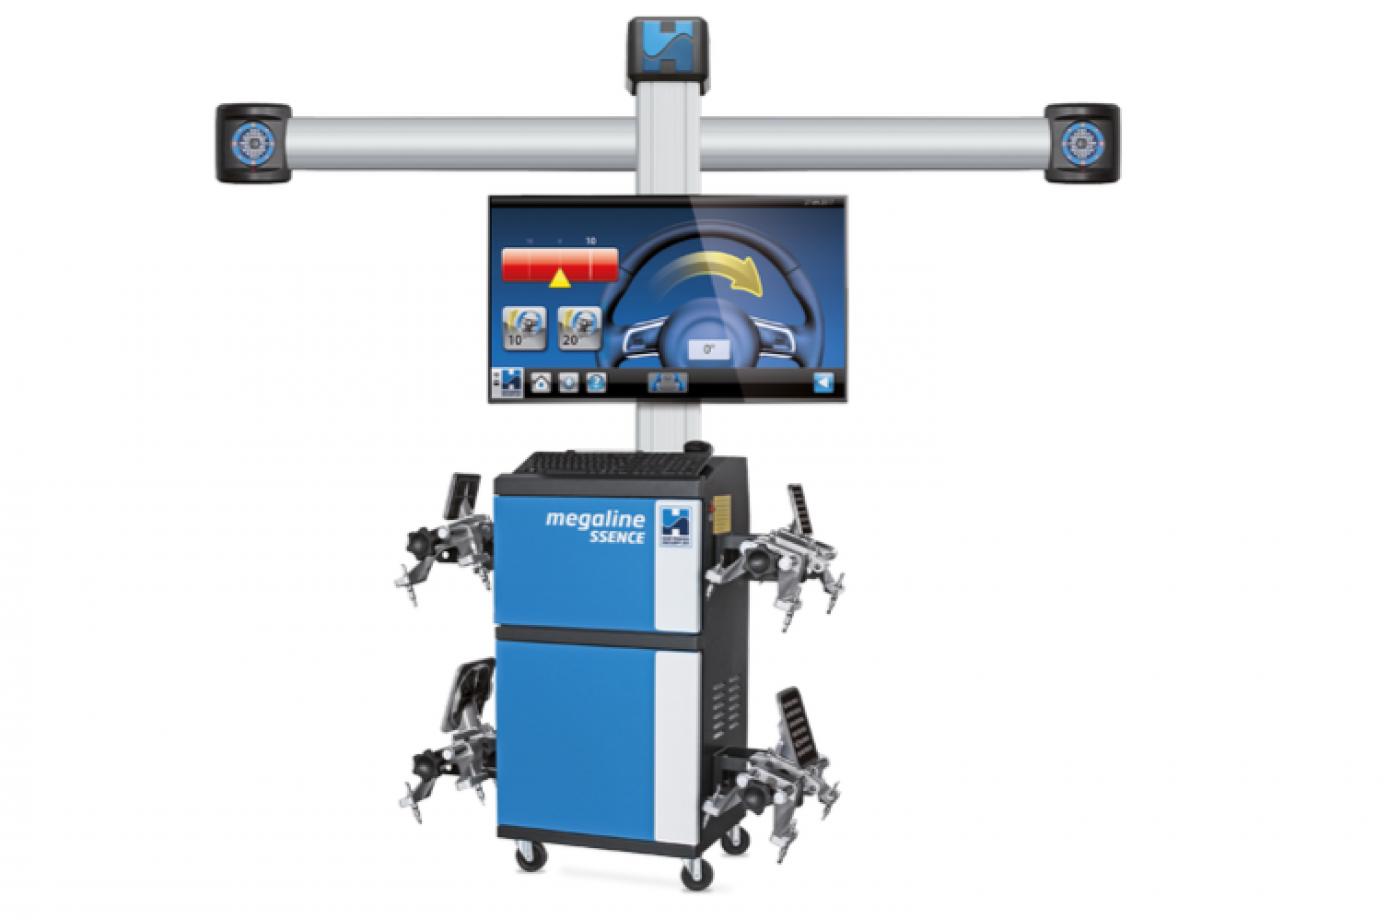 Ever-changing wheel alignment technologies explored through extensive portfolio